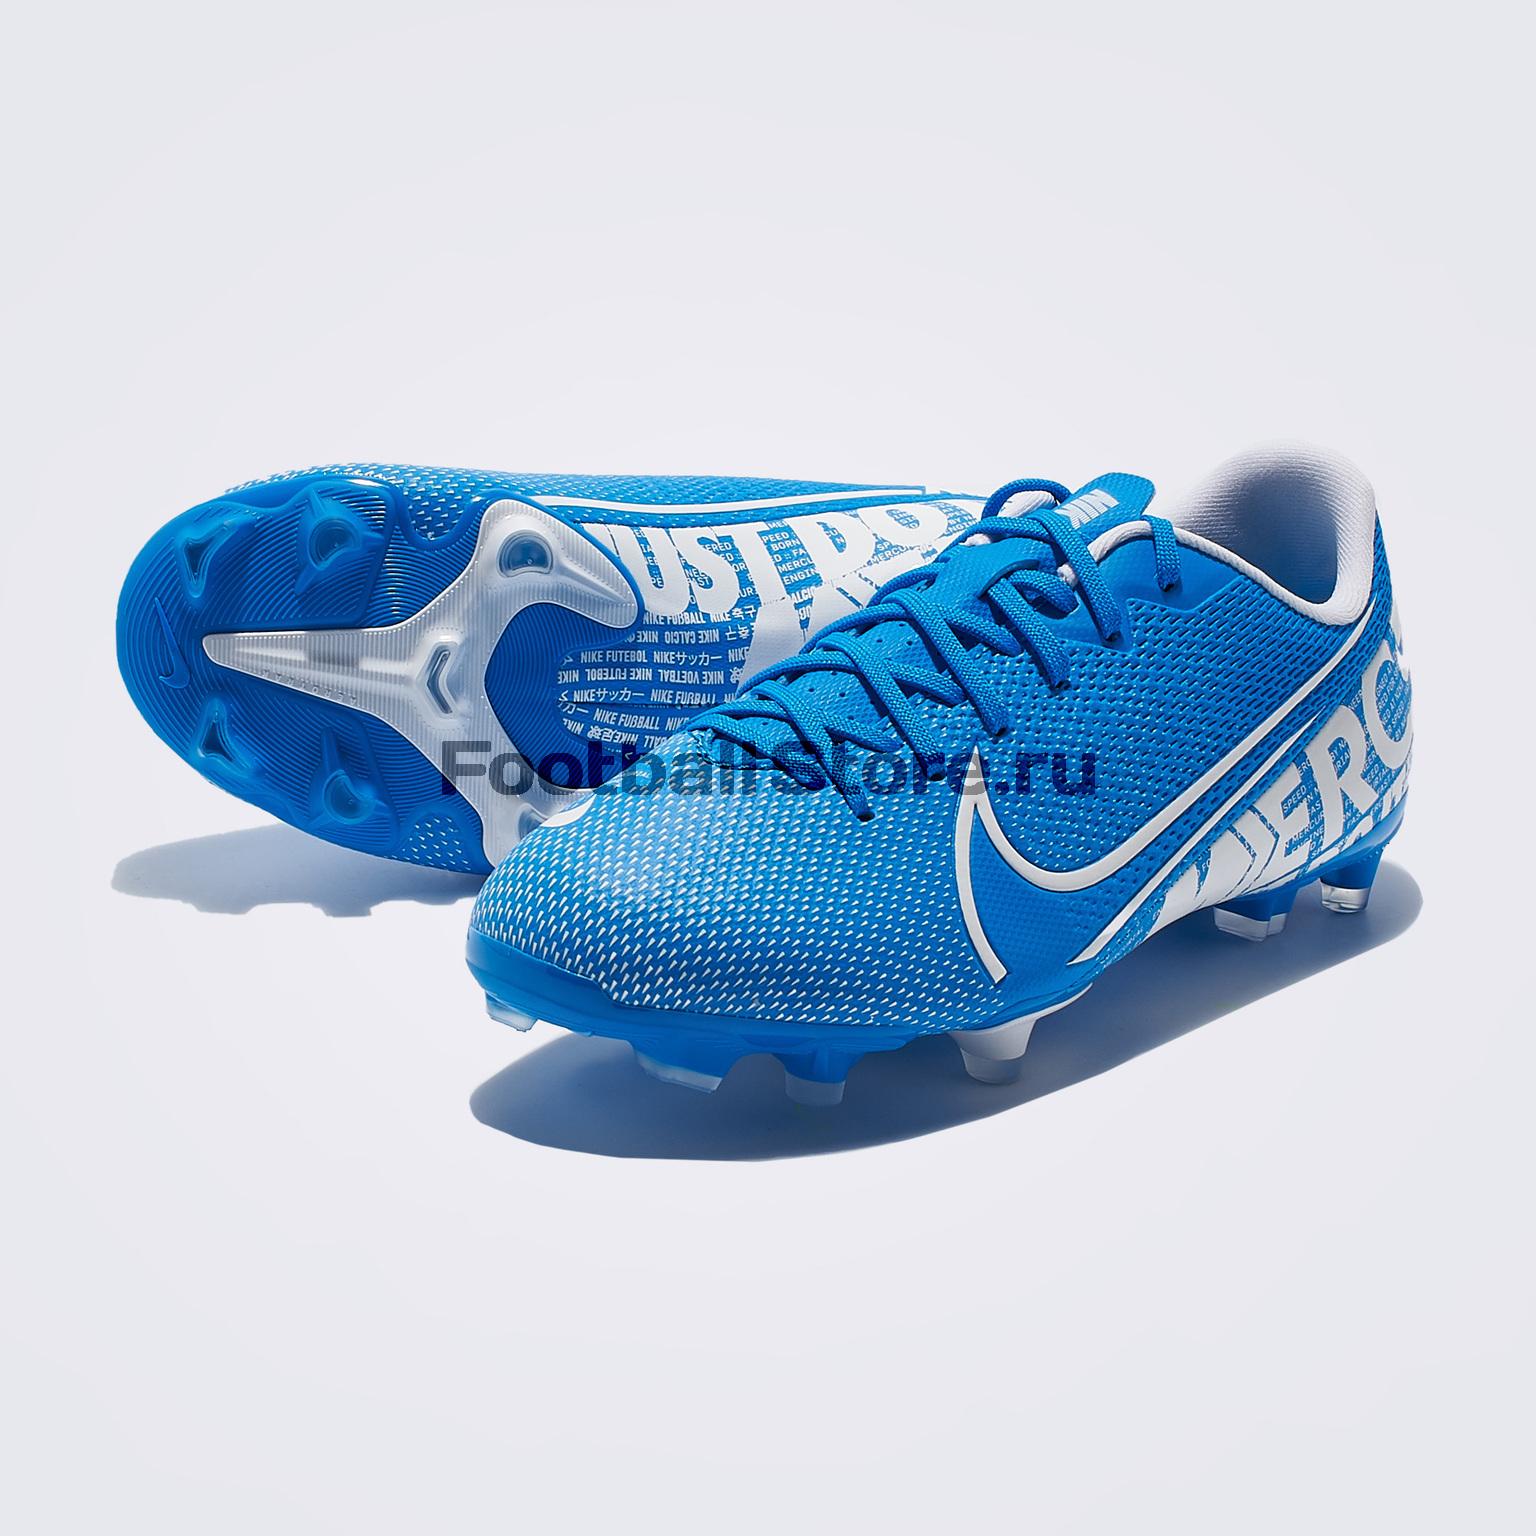 Бутсы детские Nike Vapor 13 Academy FG/MG AT8123-414